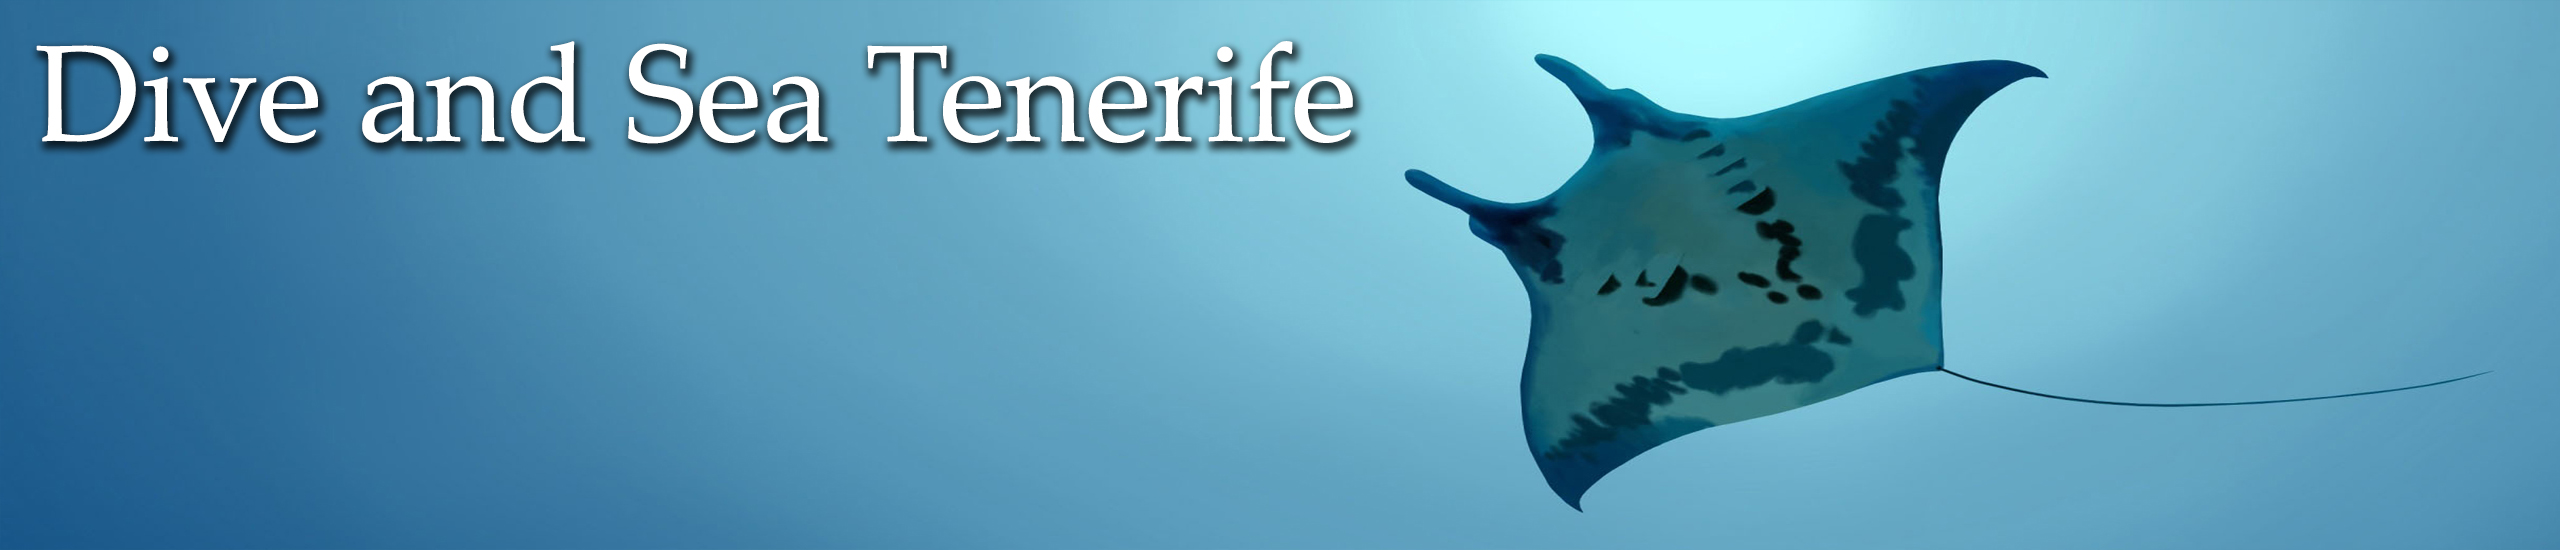 Diving in Tenerife-Dive-and-sea-tenerife-banner-manta-ray